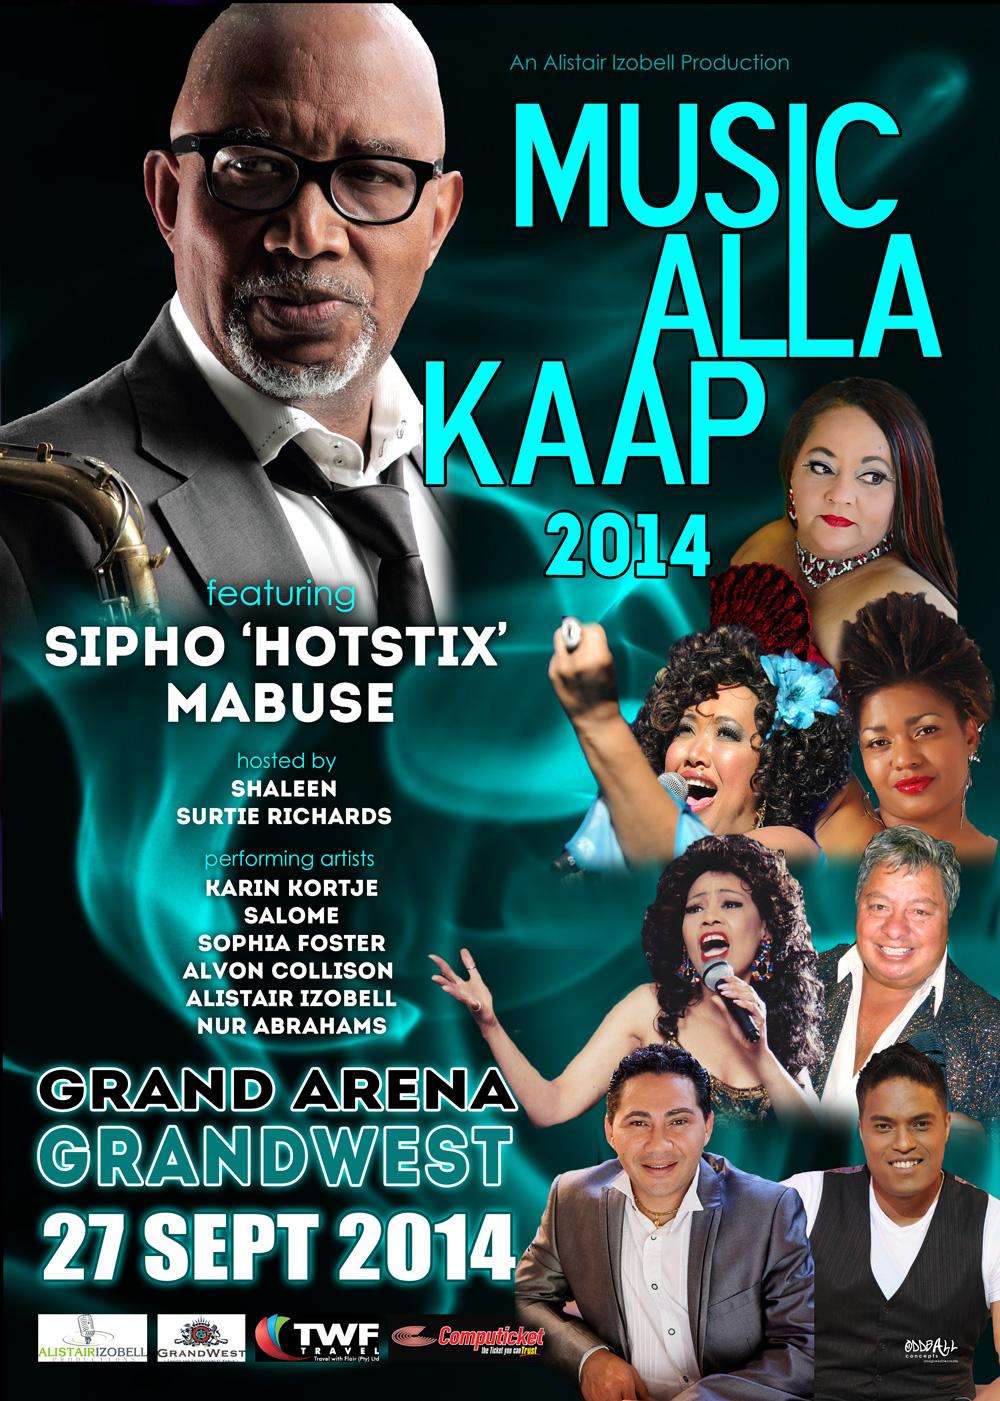 Music Alla Kaap 2014